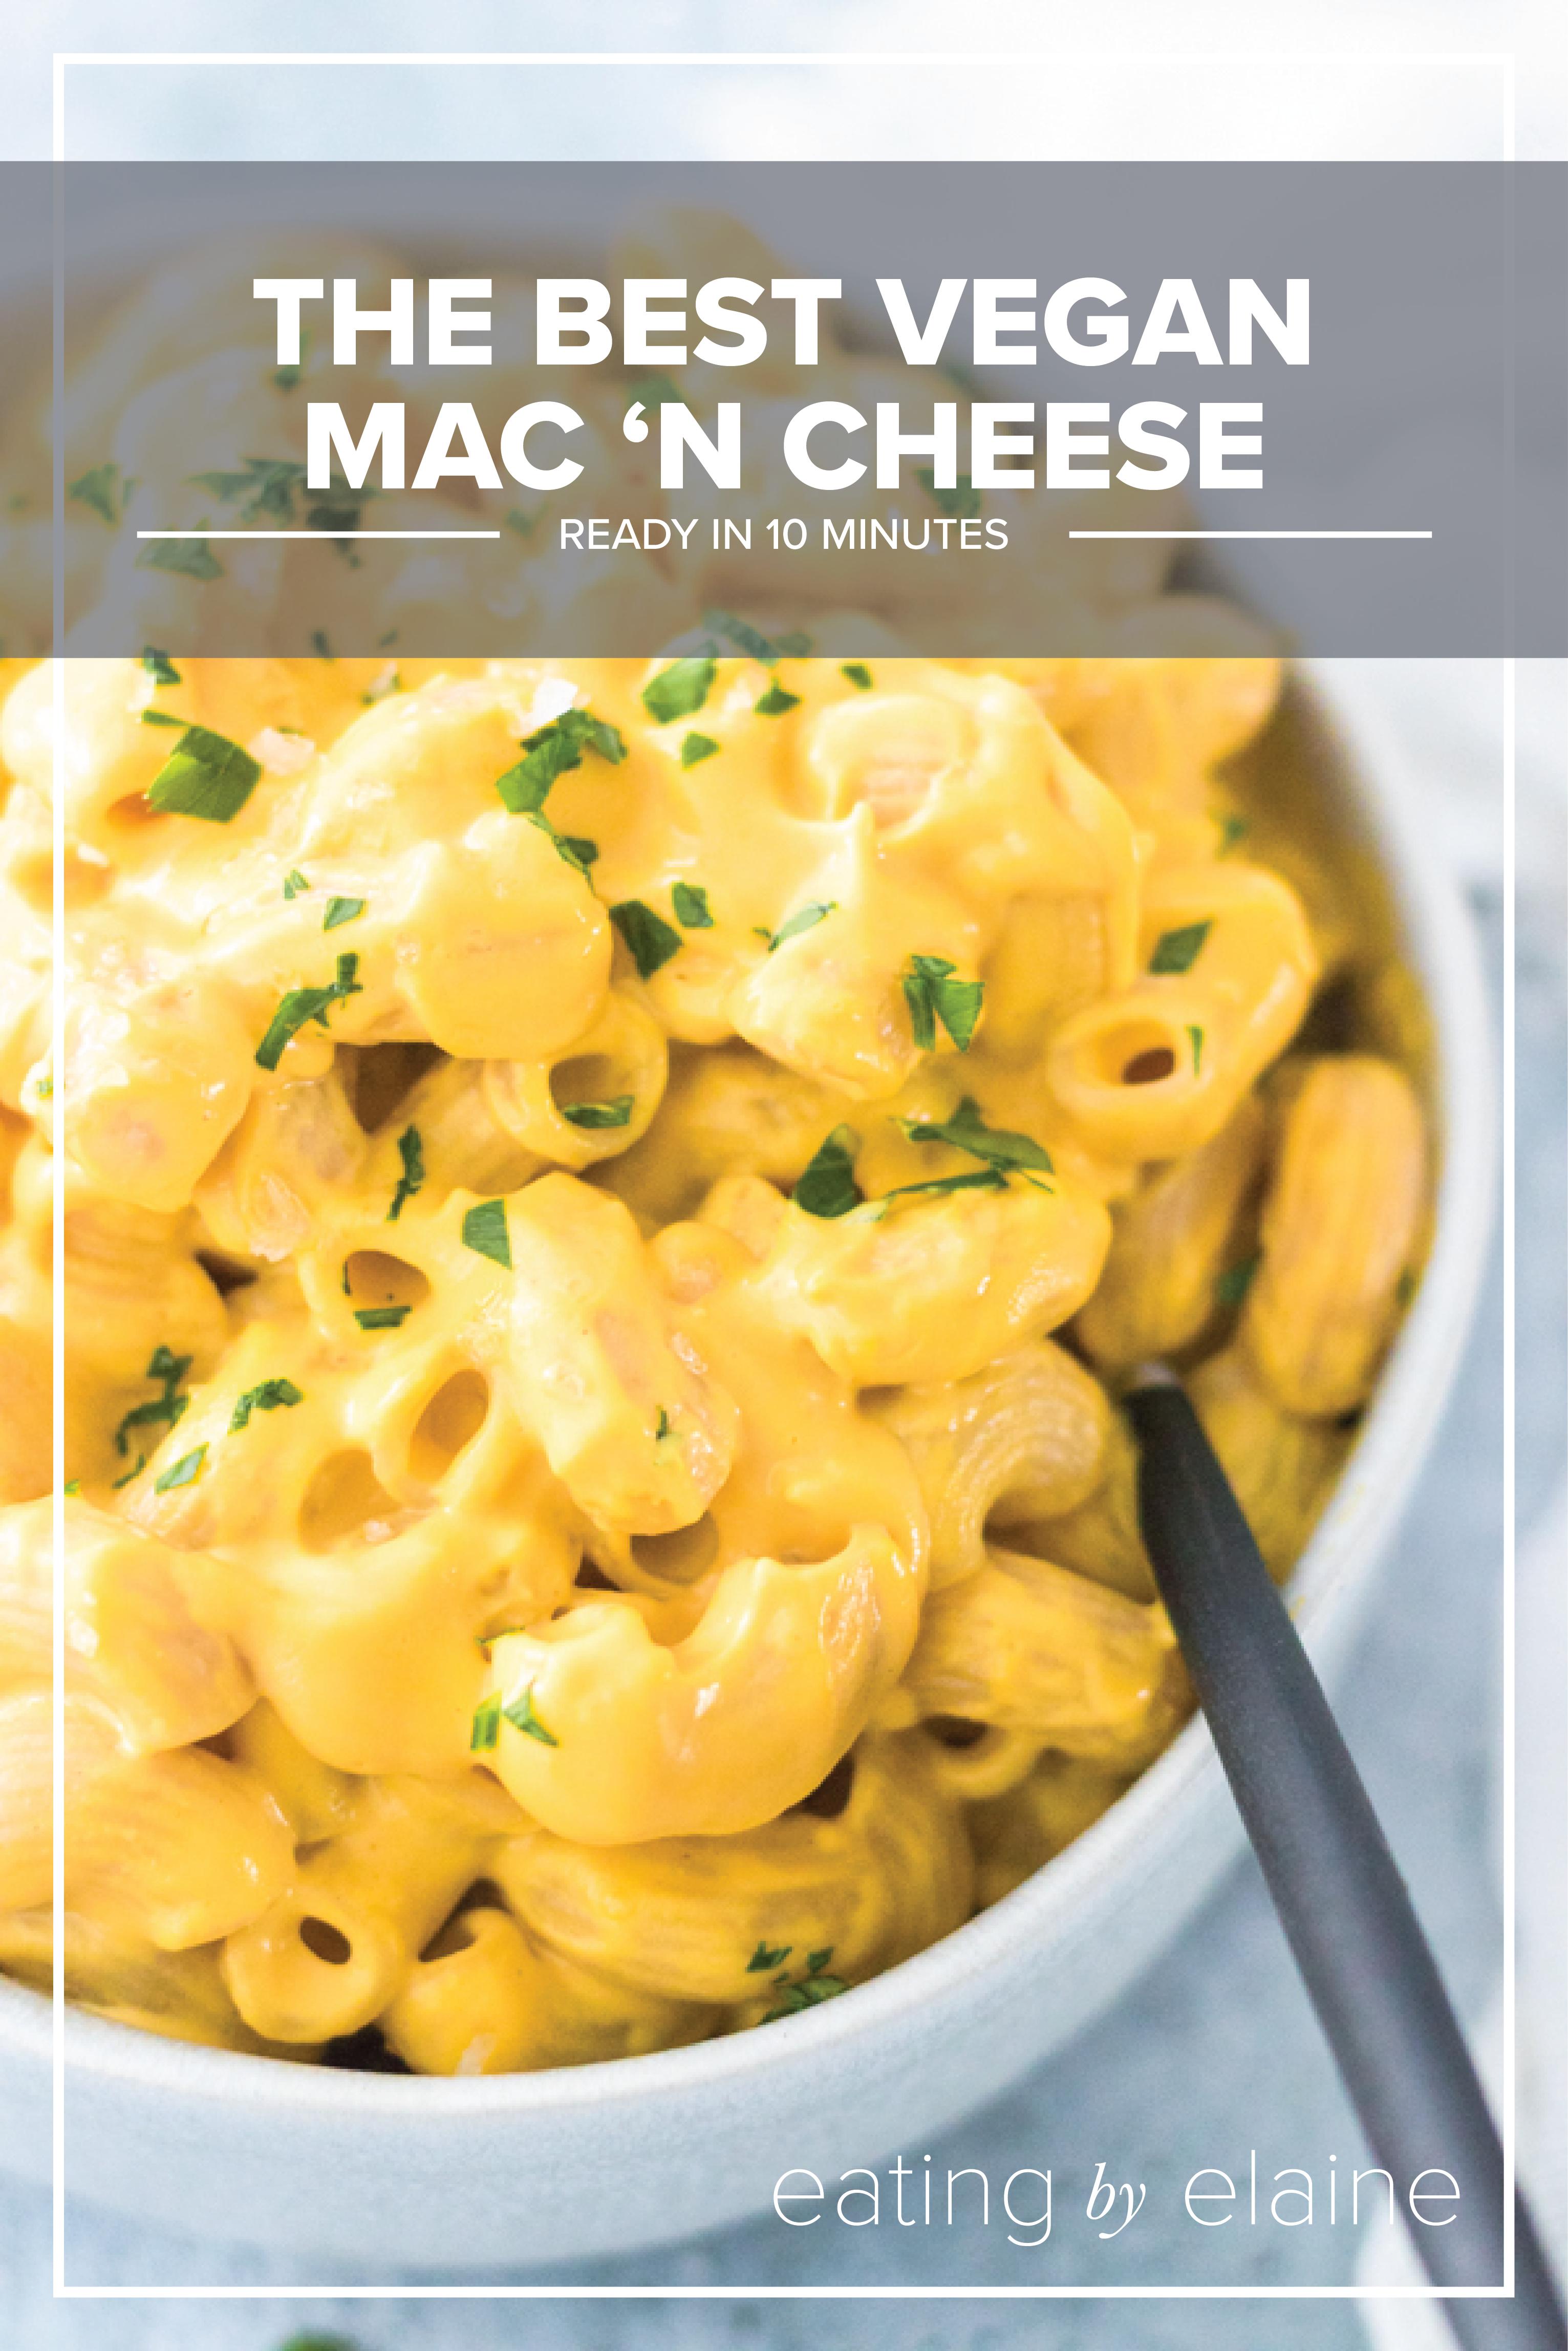 The Best Vegan Mac N Cheese In 2020 Vegan Mac N Cheese Whole Food Recipes Recipes